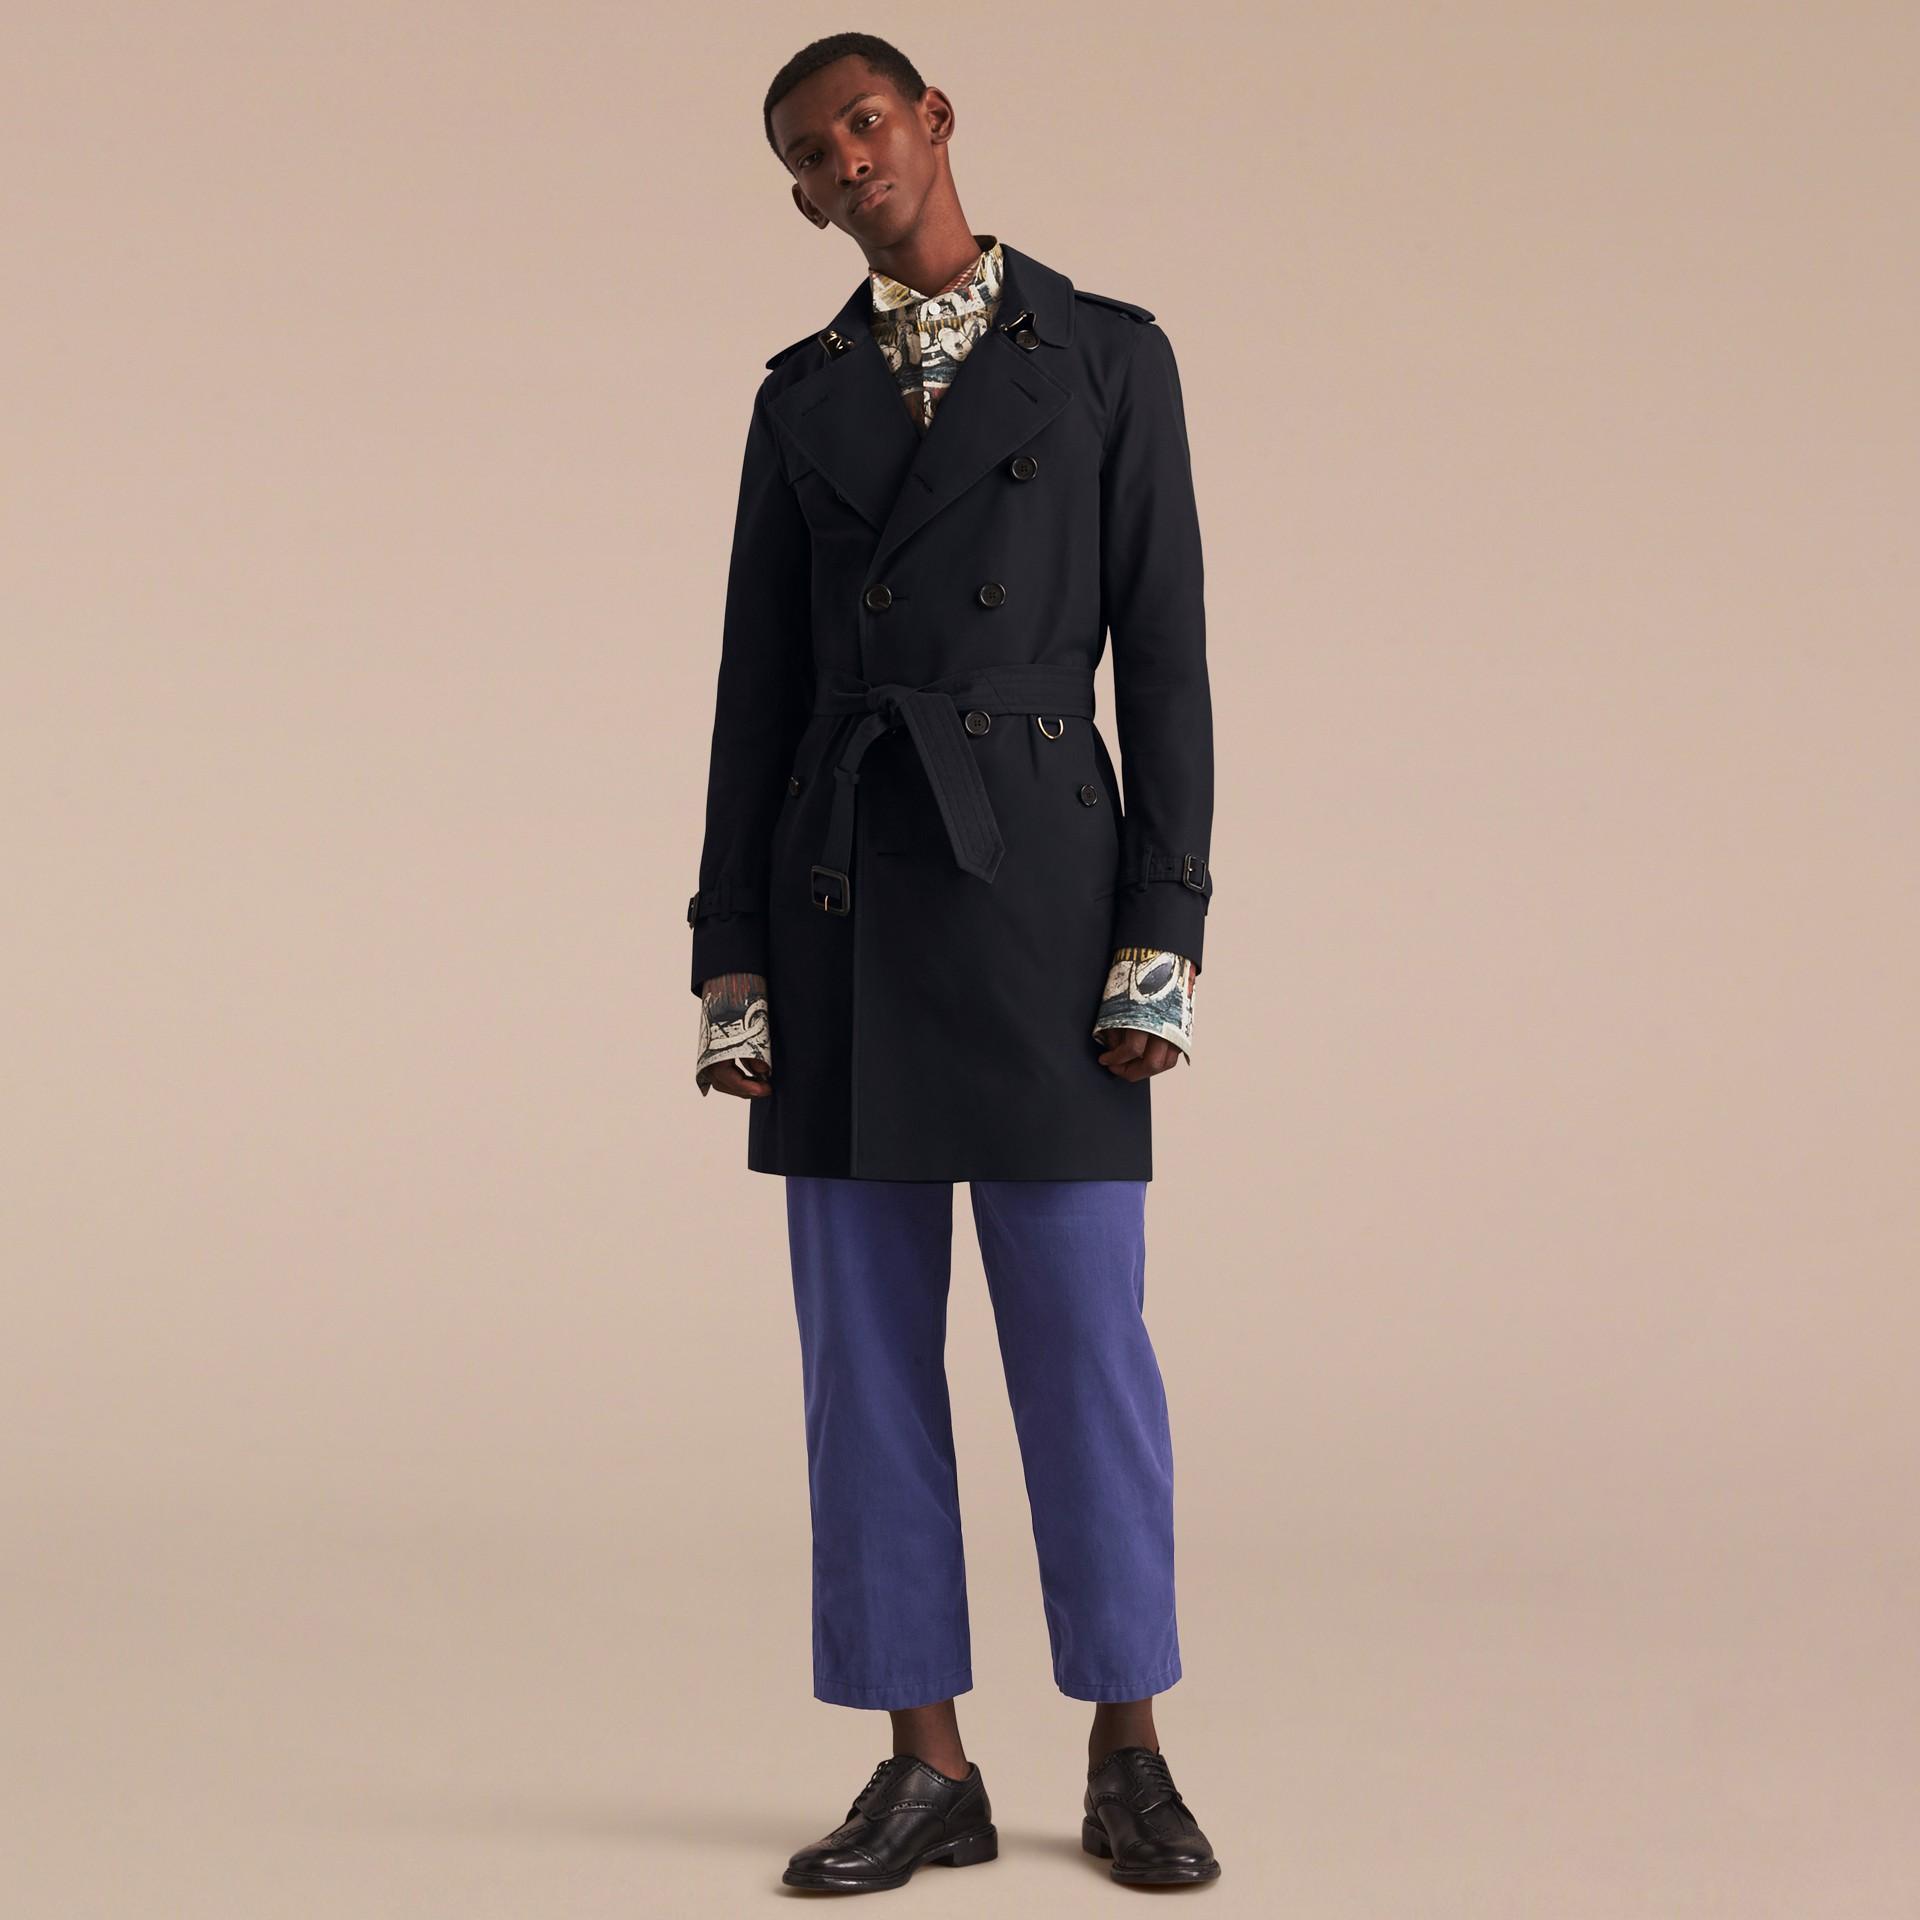 Azul marinho The Sandringham - Trench coat Heritage longo Azul Marinho - galeria de imagens 9